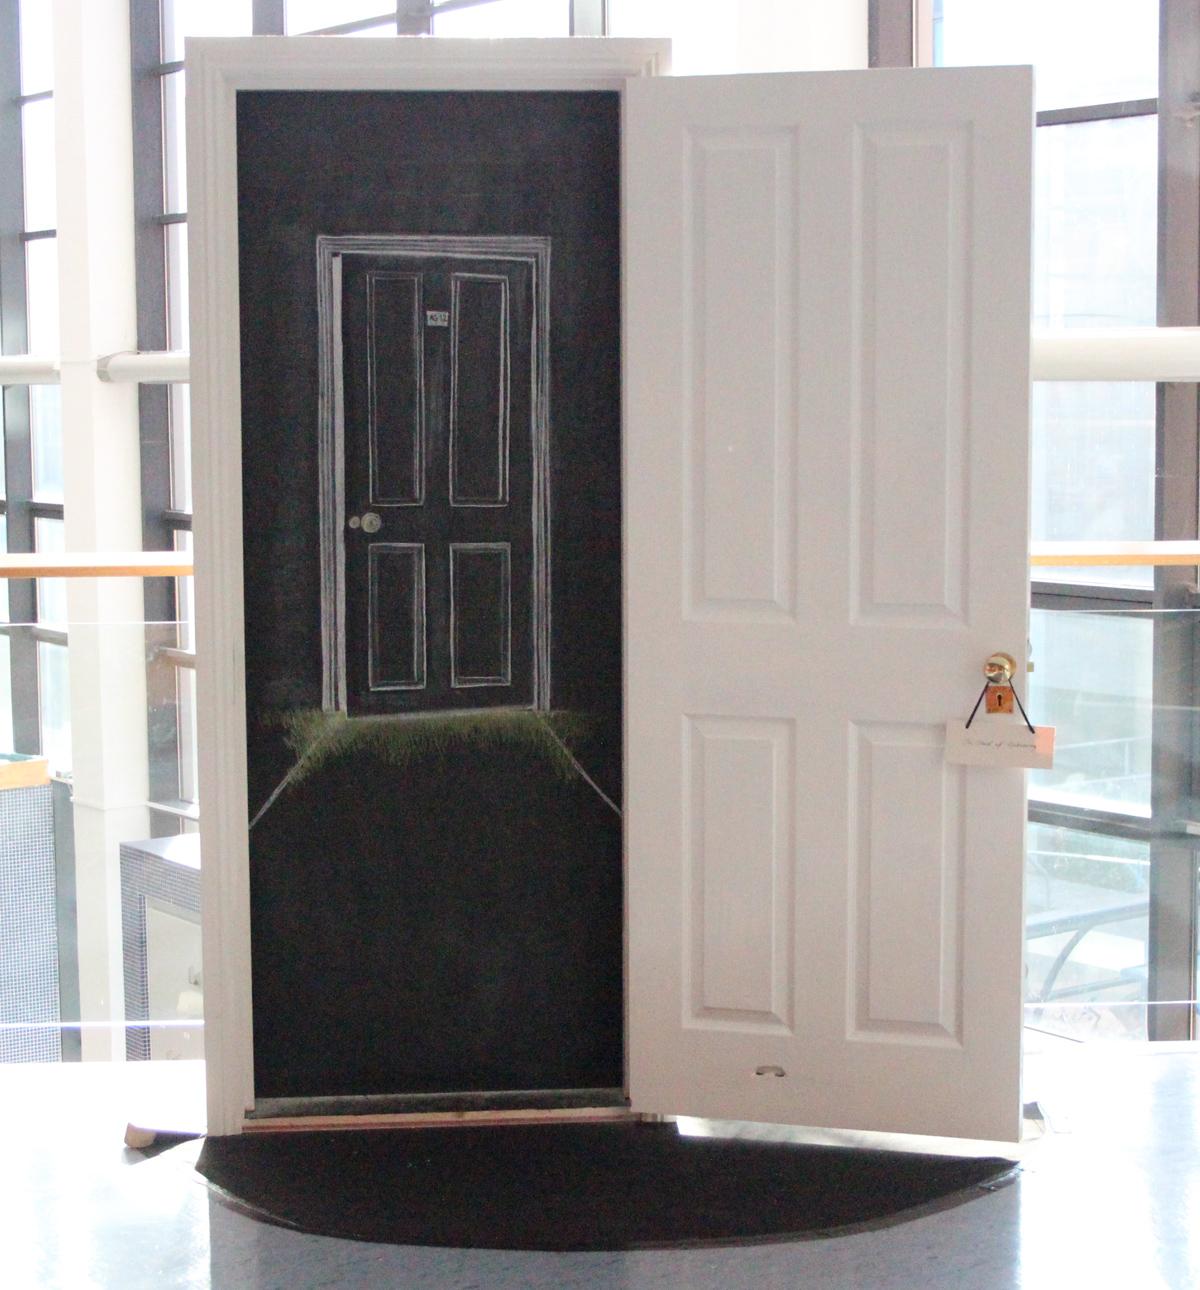 The door to AG 12 is cracked ajar.